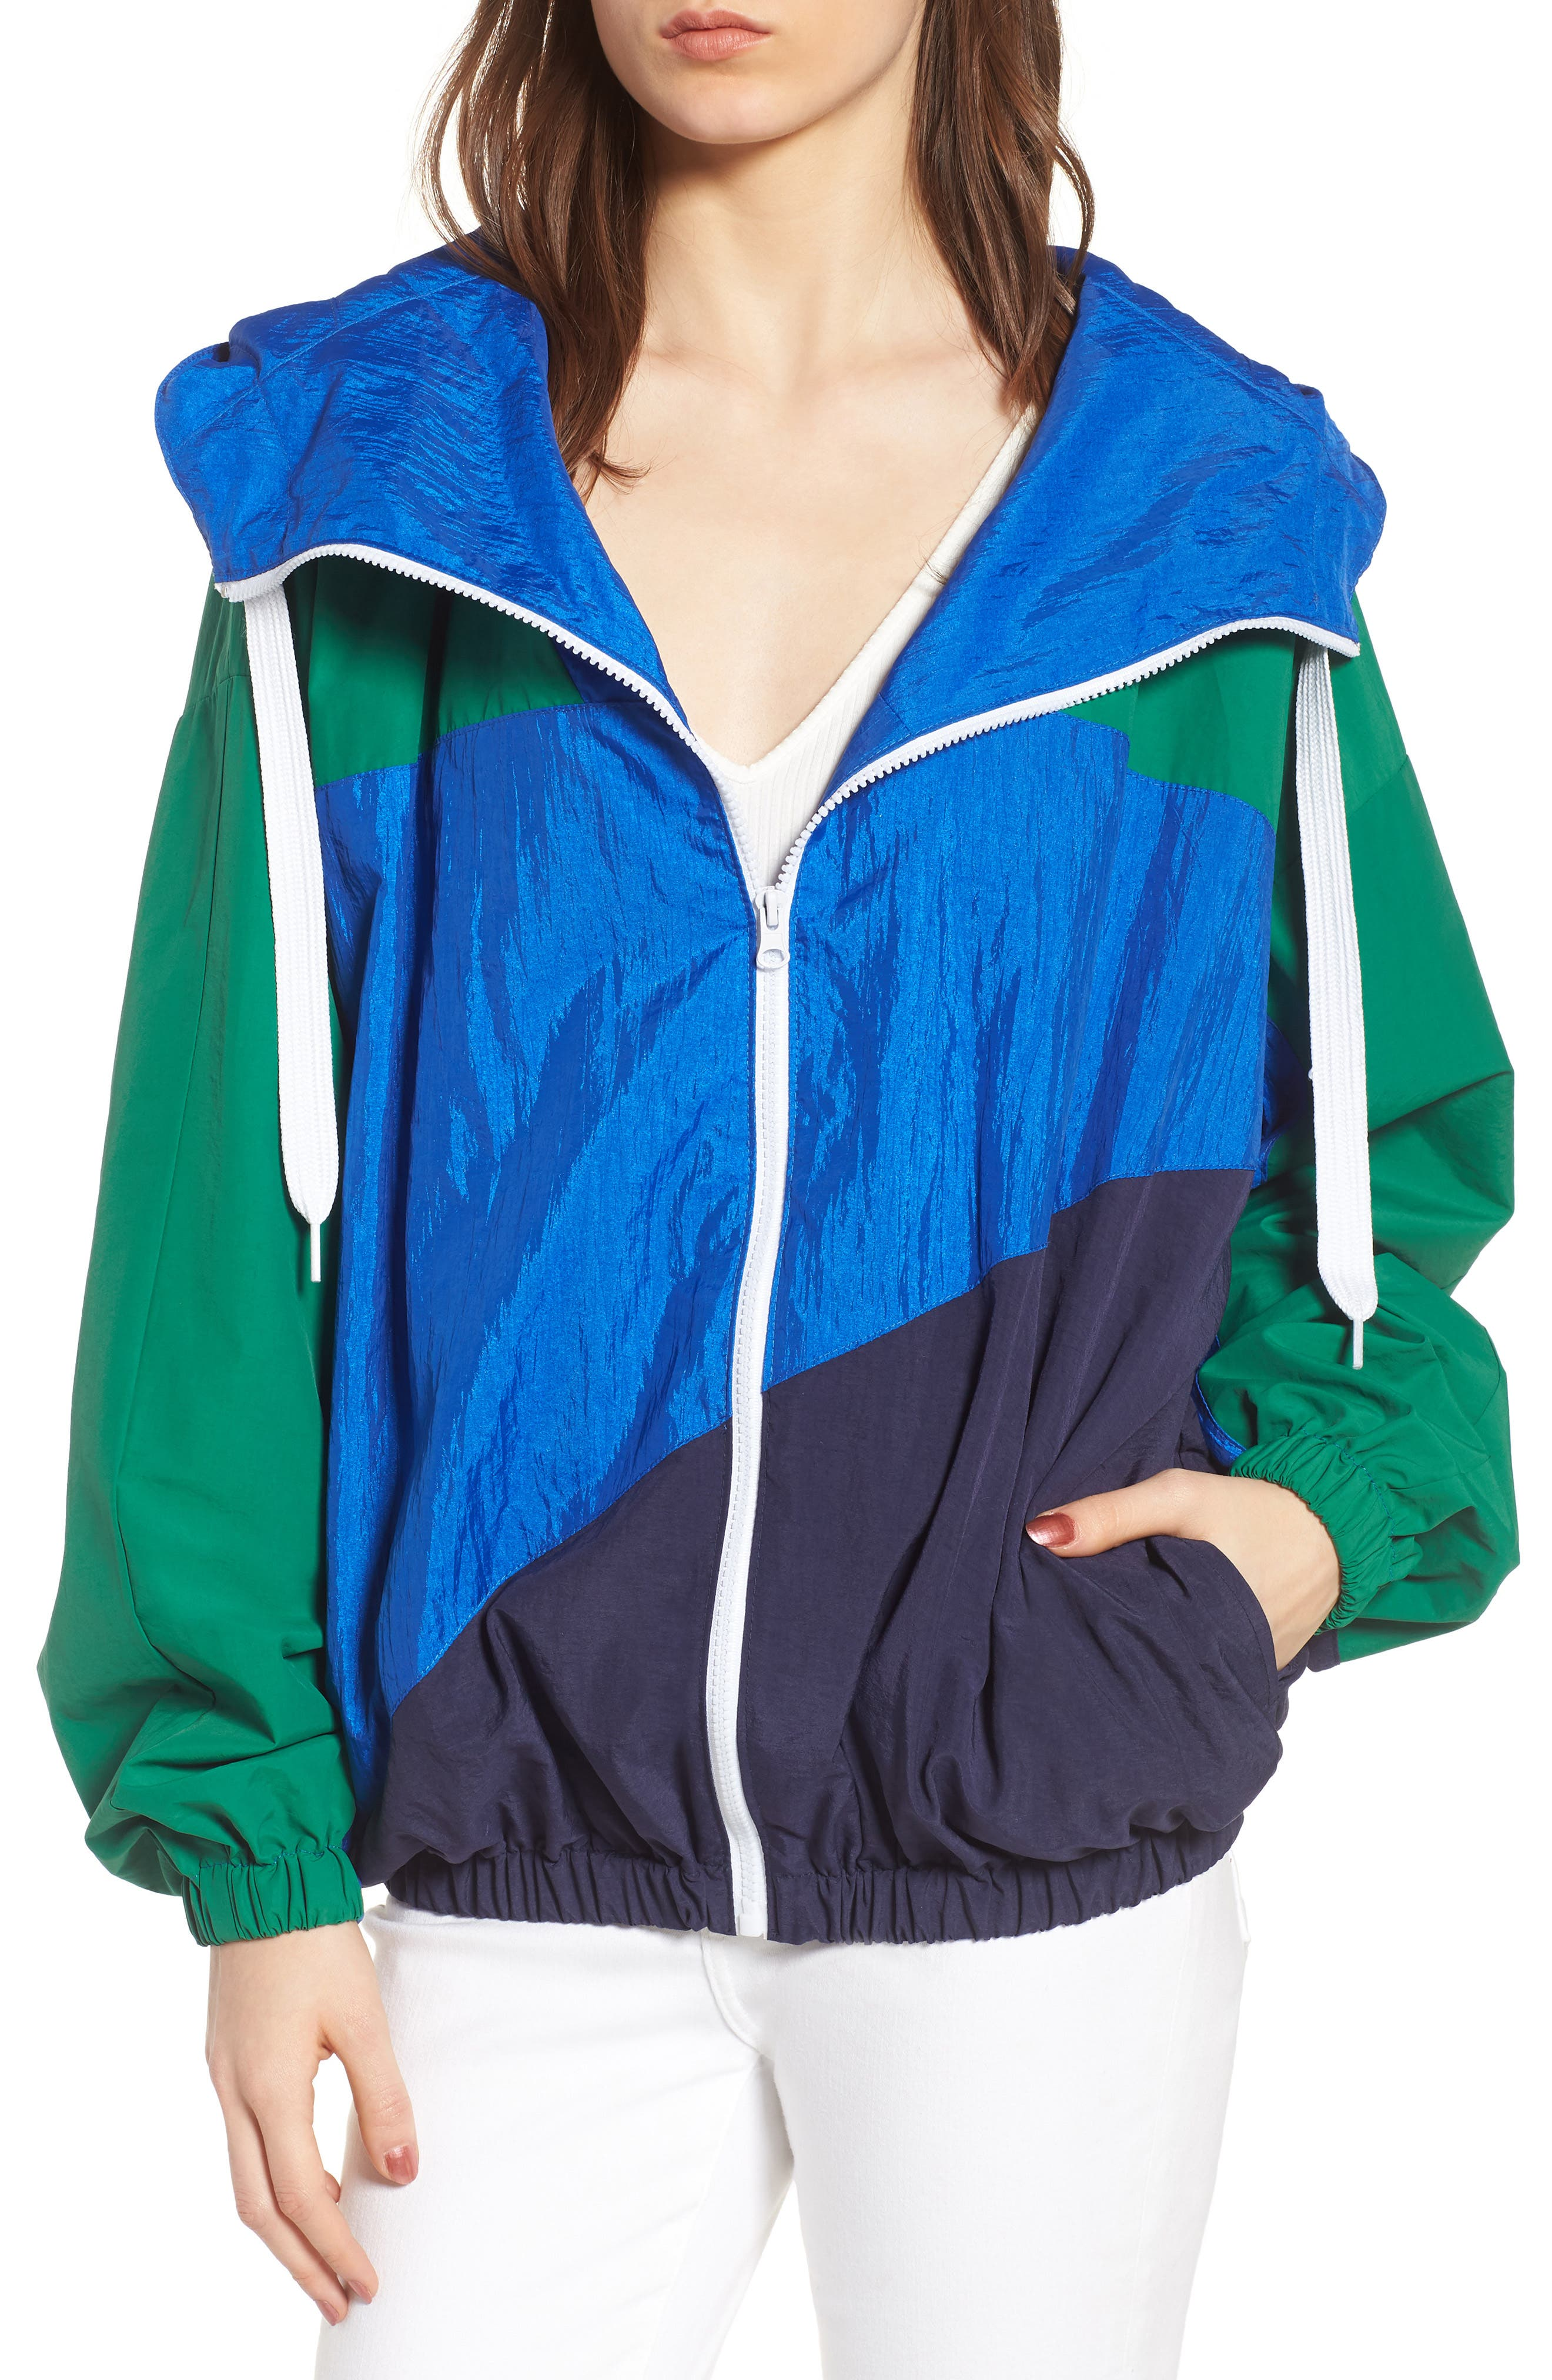 Colorblock Windbreaker Jacket,                             Alternate thumbnail 2, color,                             Green/ Blue